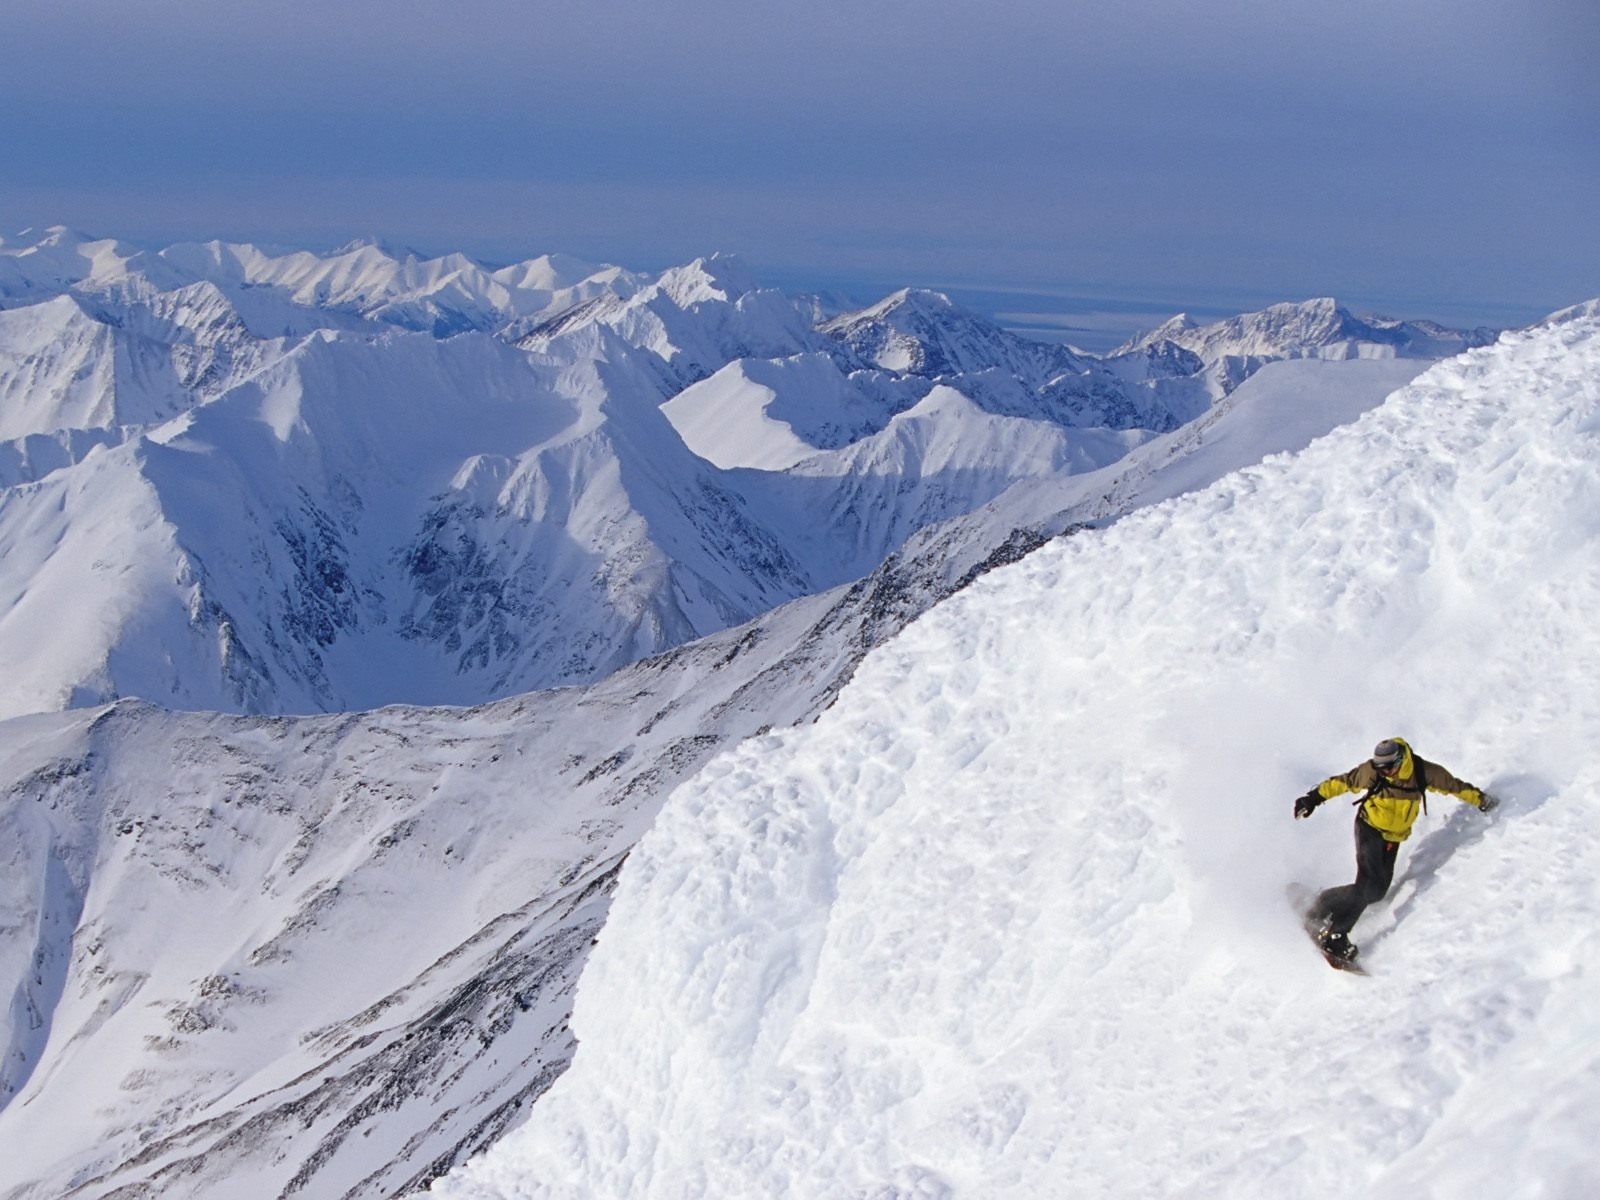 alaskan snowboarding wallpaper snowboarding sports wallpapers in jpg